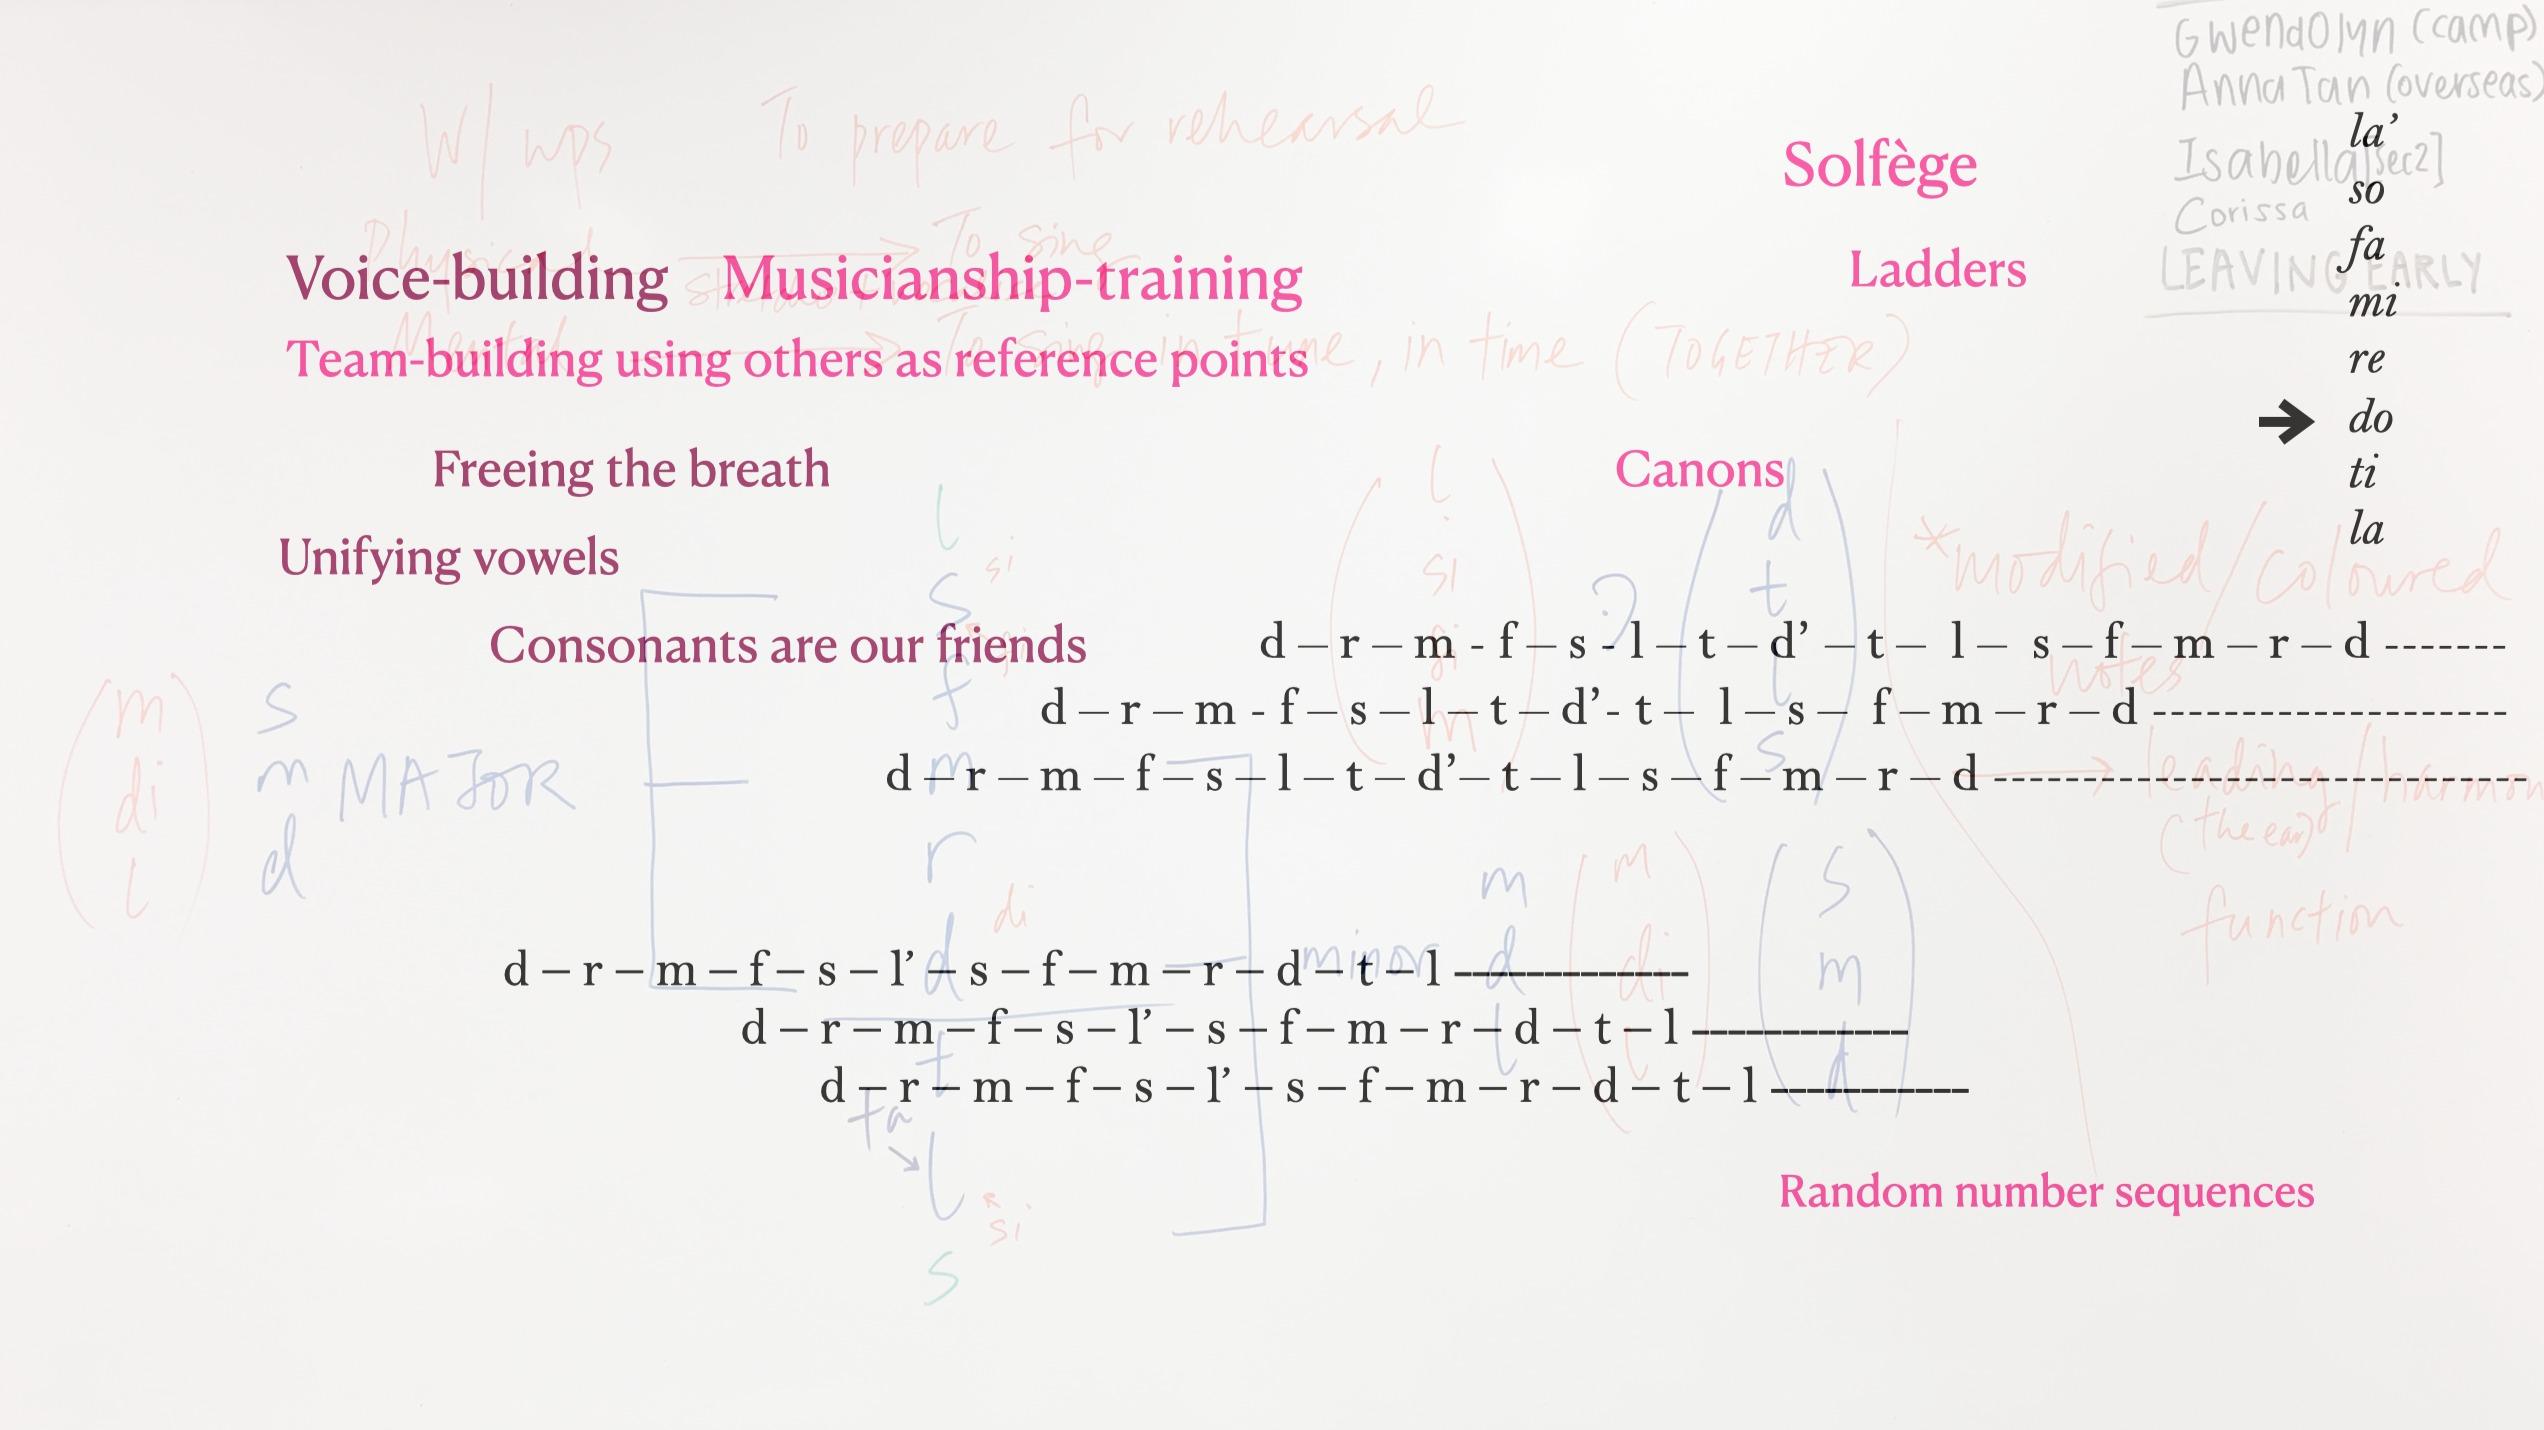 Tham Musicianship - Solfege canons